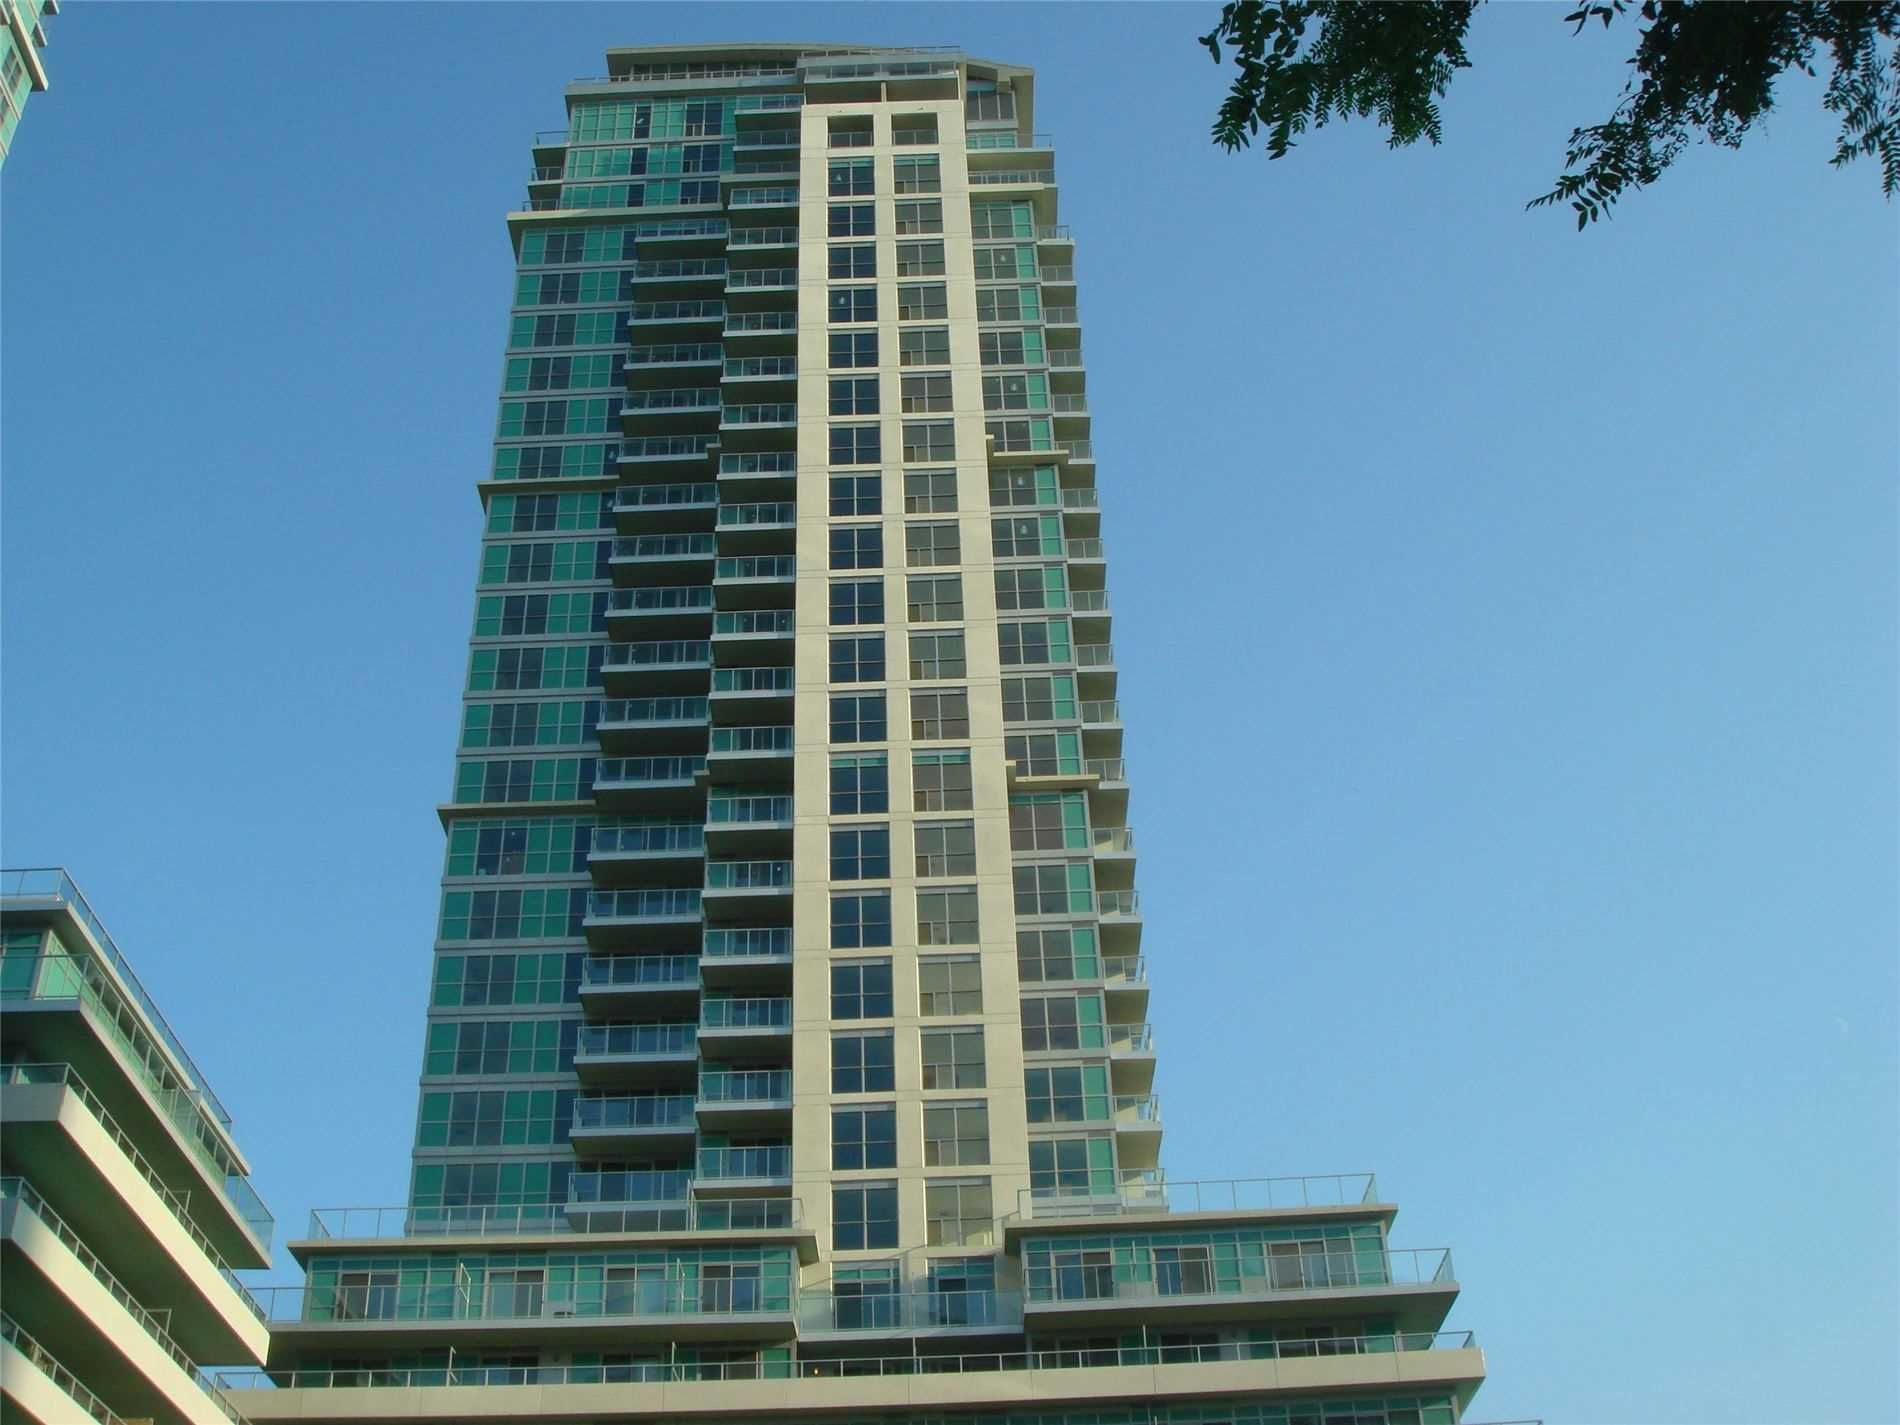 Main Photo: 506 60 Town Centre Court in Toronto: Bendale Condo for lease (Toronto E09)  : MLS®# E5374404